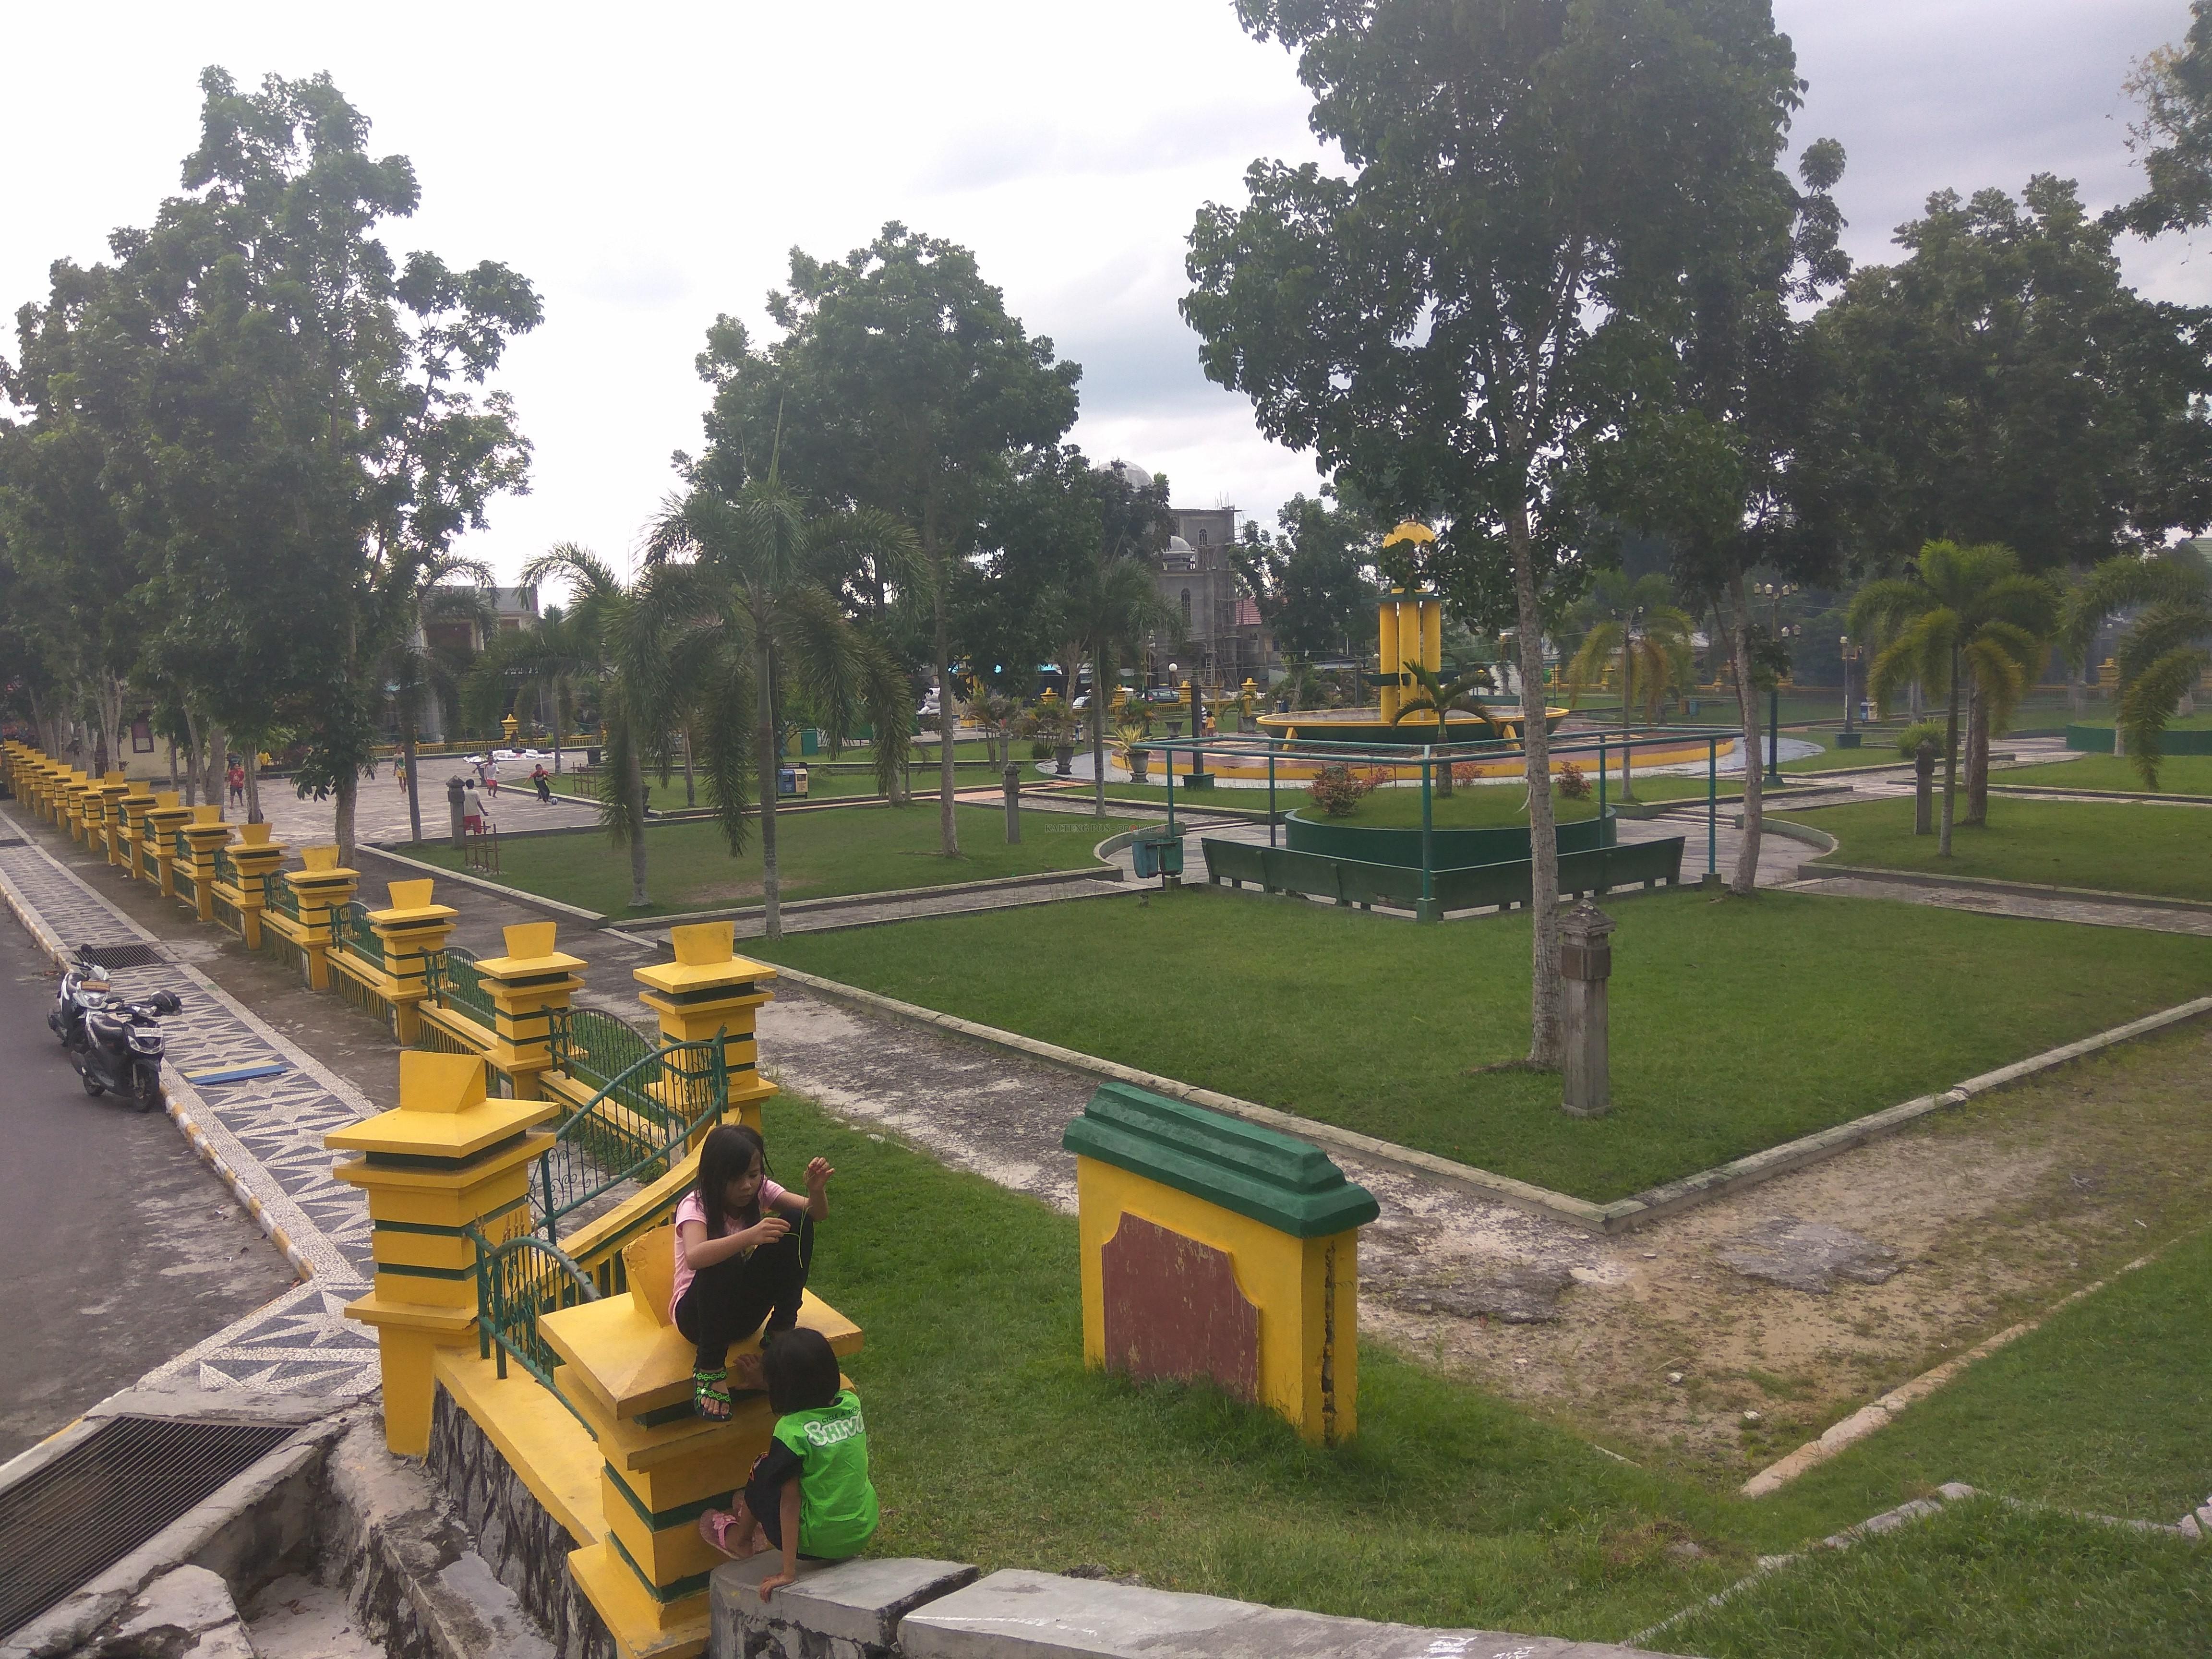 Gratis 60 Lapak Pasar Ramadan Pindah Lapangan Tugu Tampak Lokasi